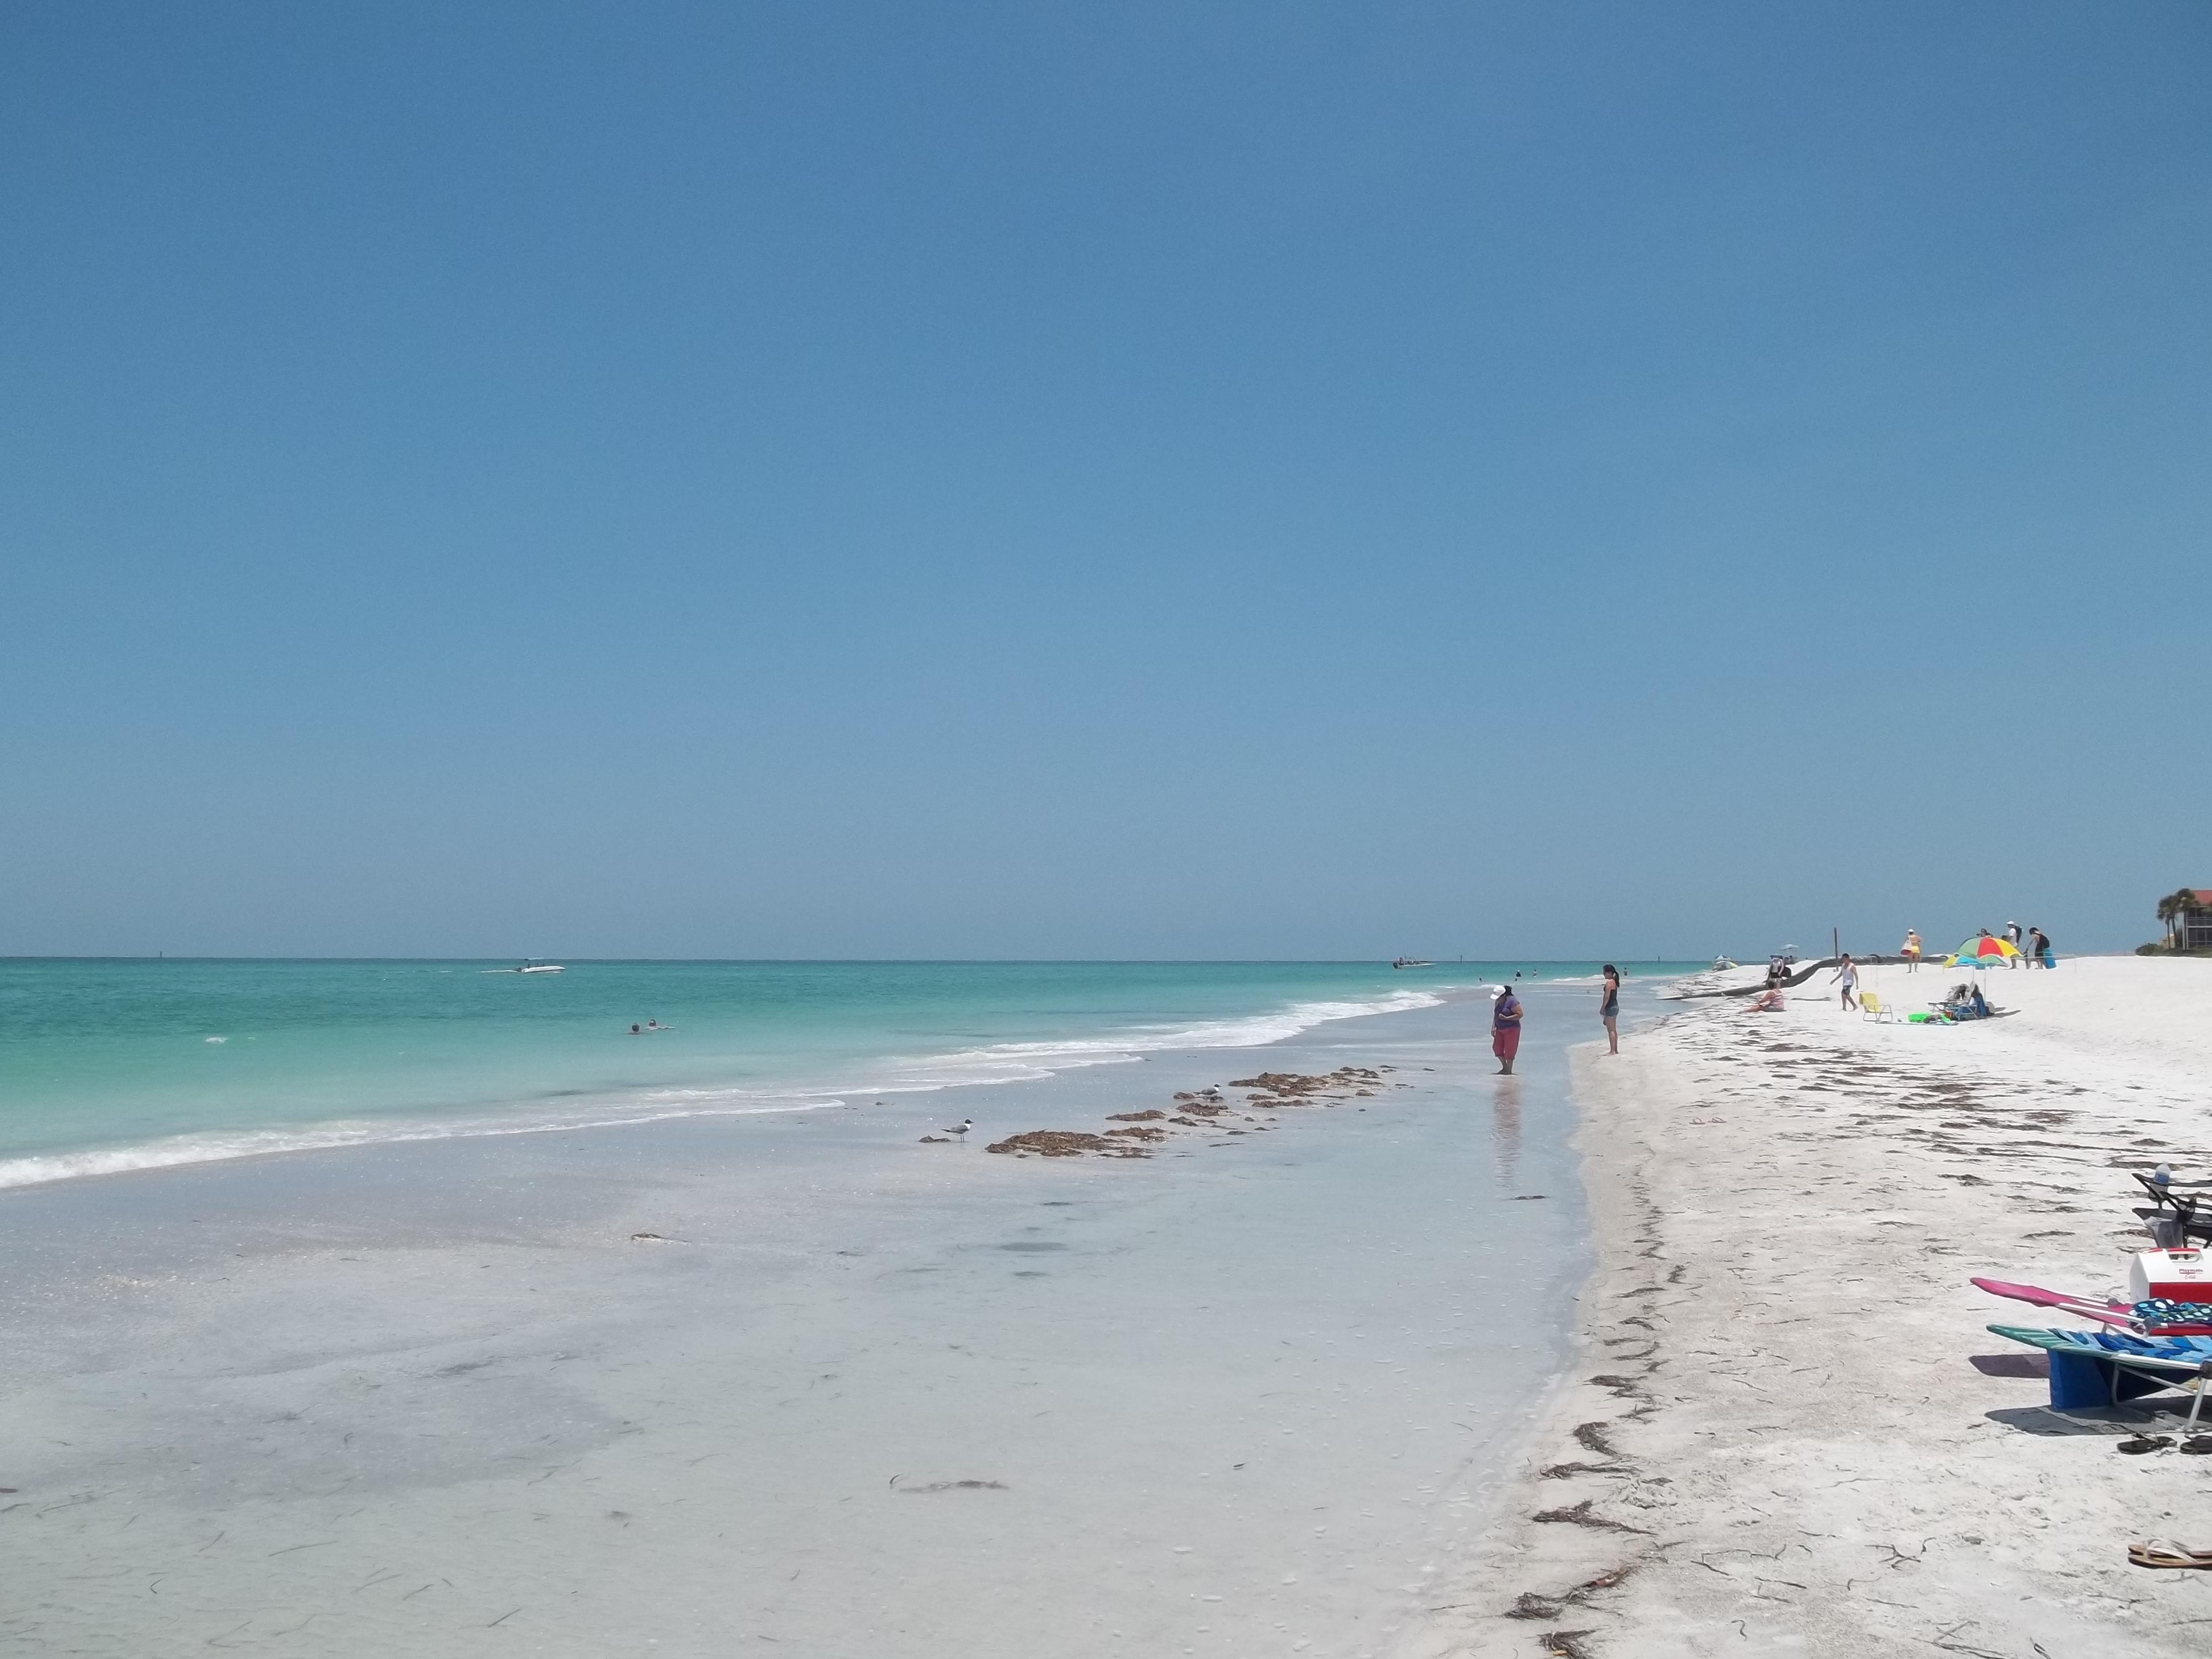 Beach Siesta Key Hotels Booking For Tomorrow